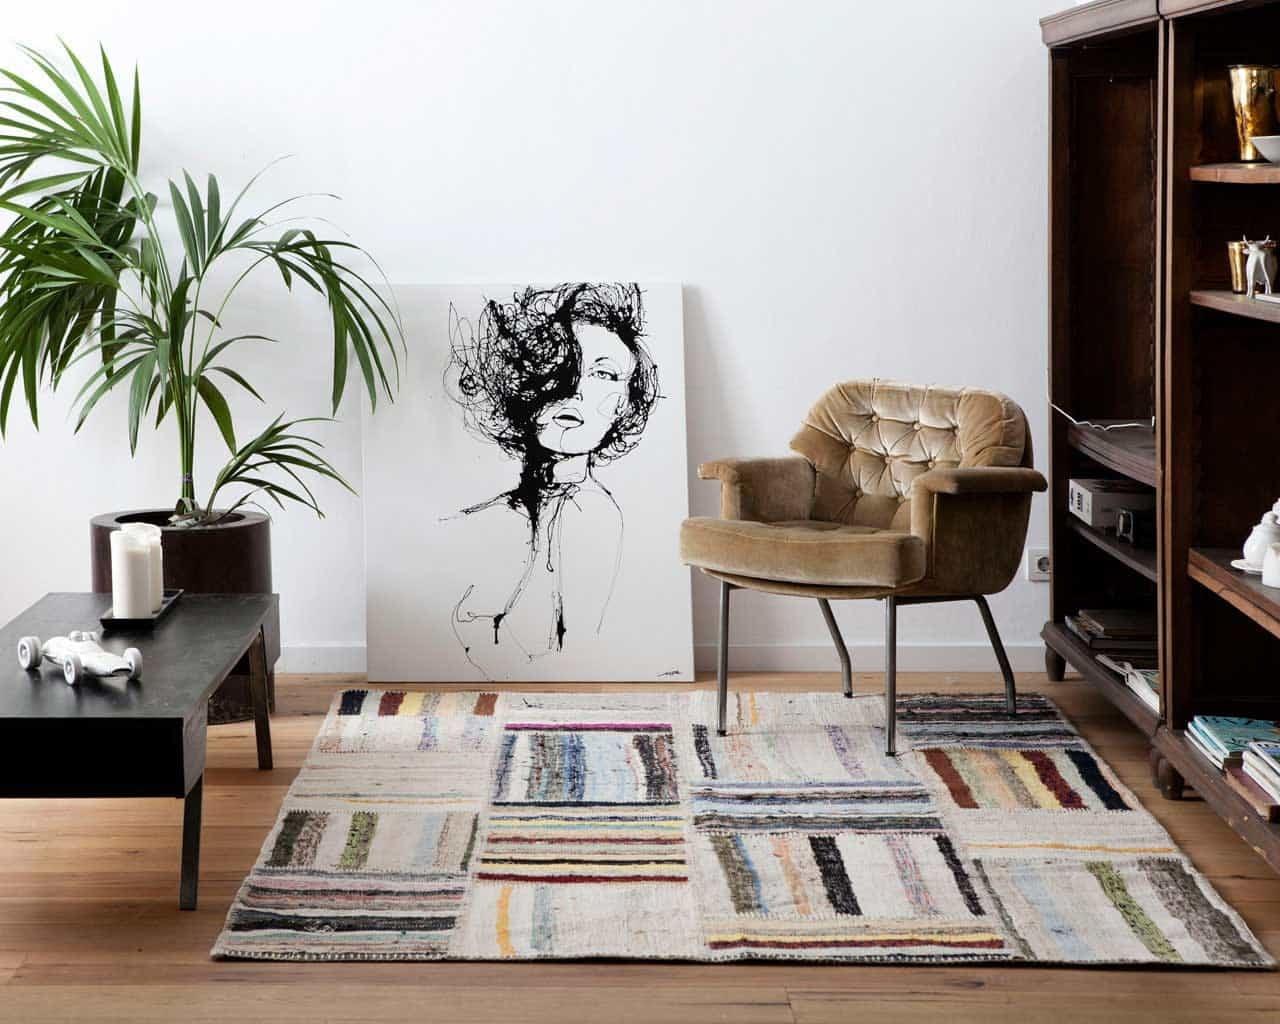 design miss - design blog, arredamento, interior design magazine ... - Arredamento Interior Design